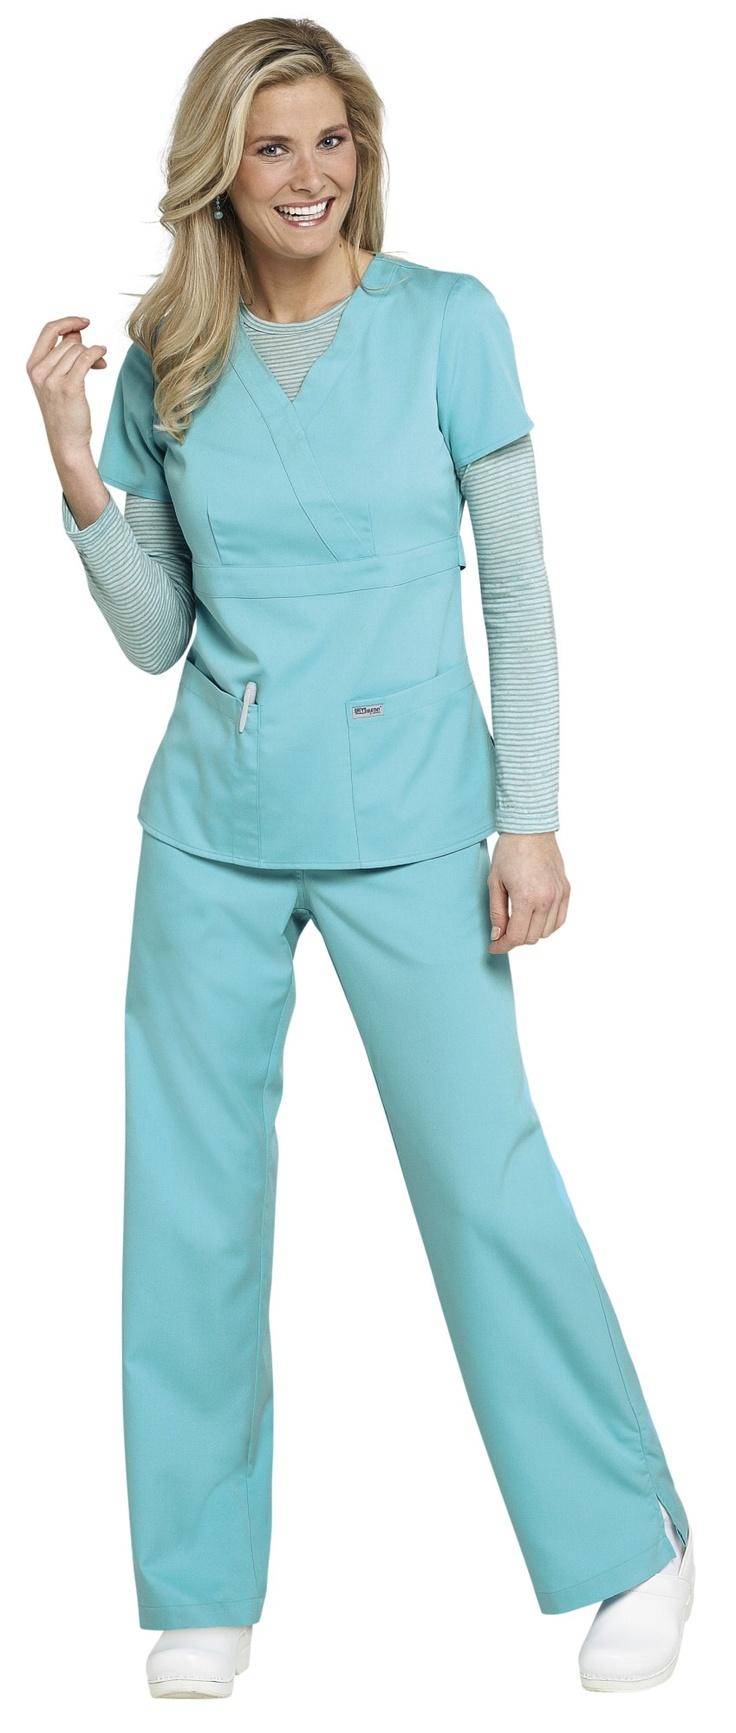 Grey anatomy scrubs coupon